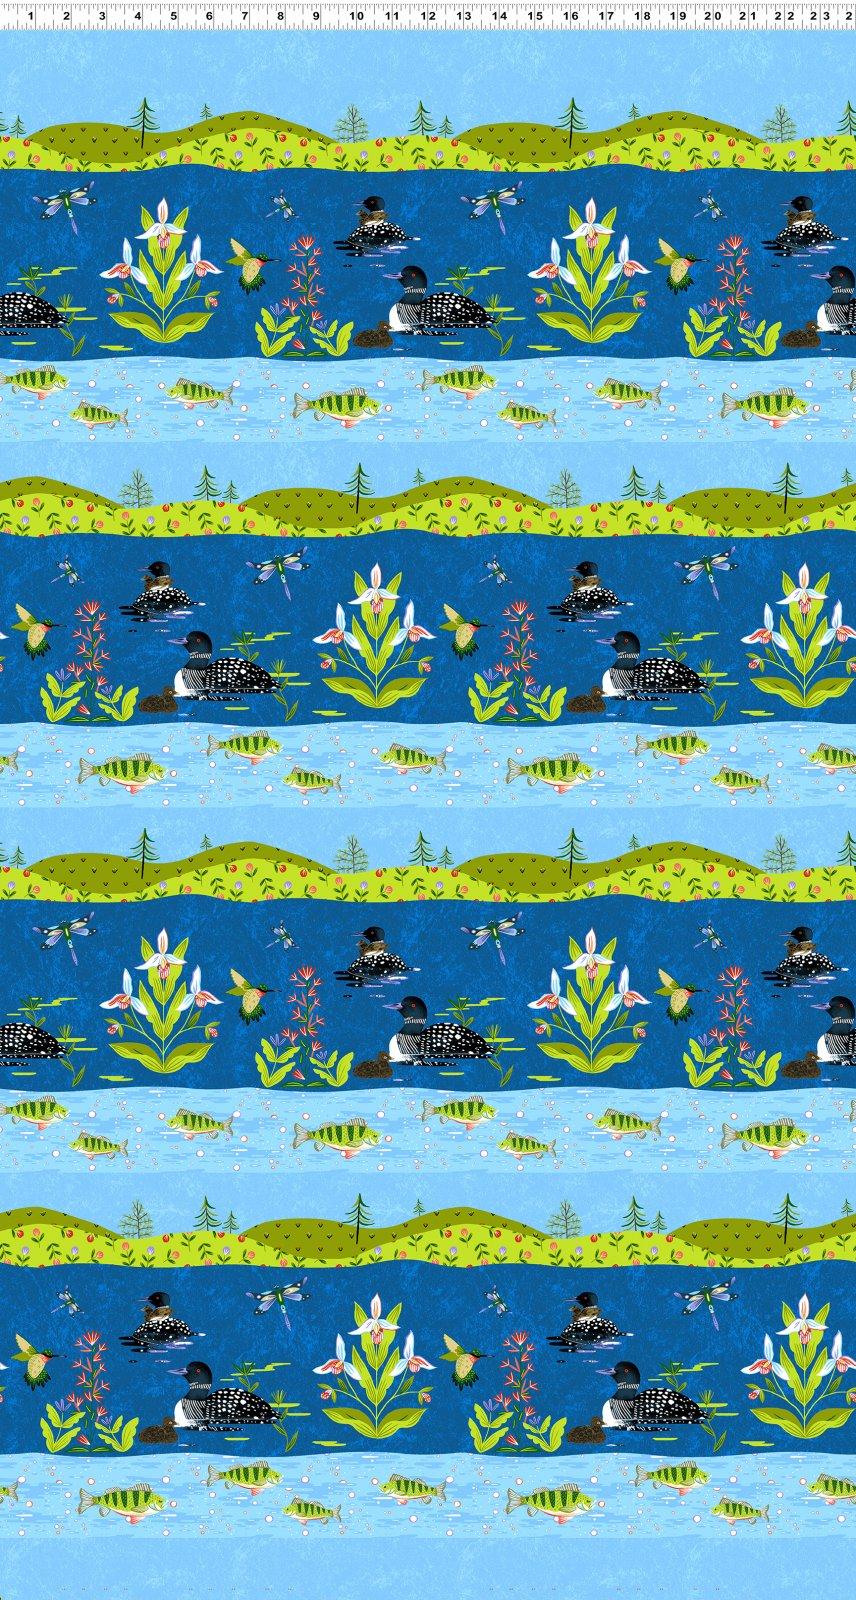 Quilt Minnesota Shop Hop 2020 - Pictoral Stripe Royal Blue